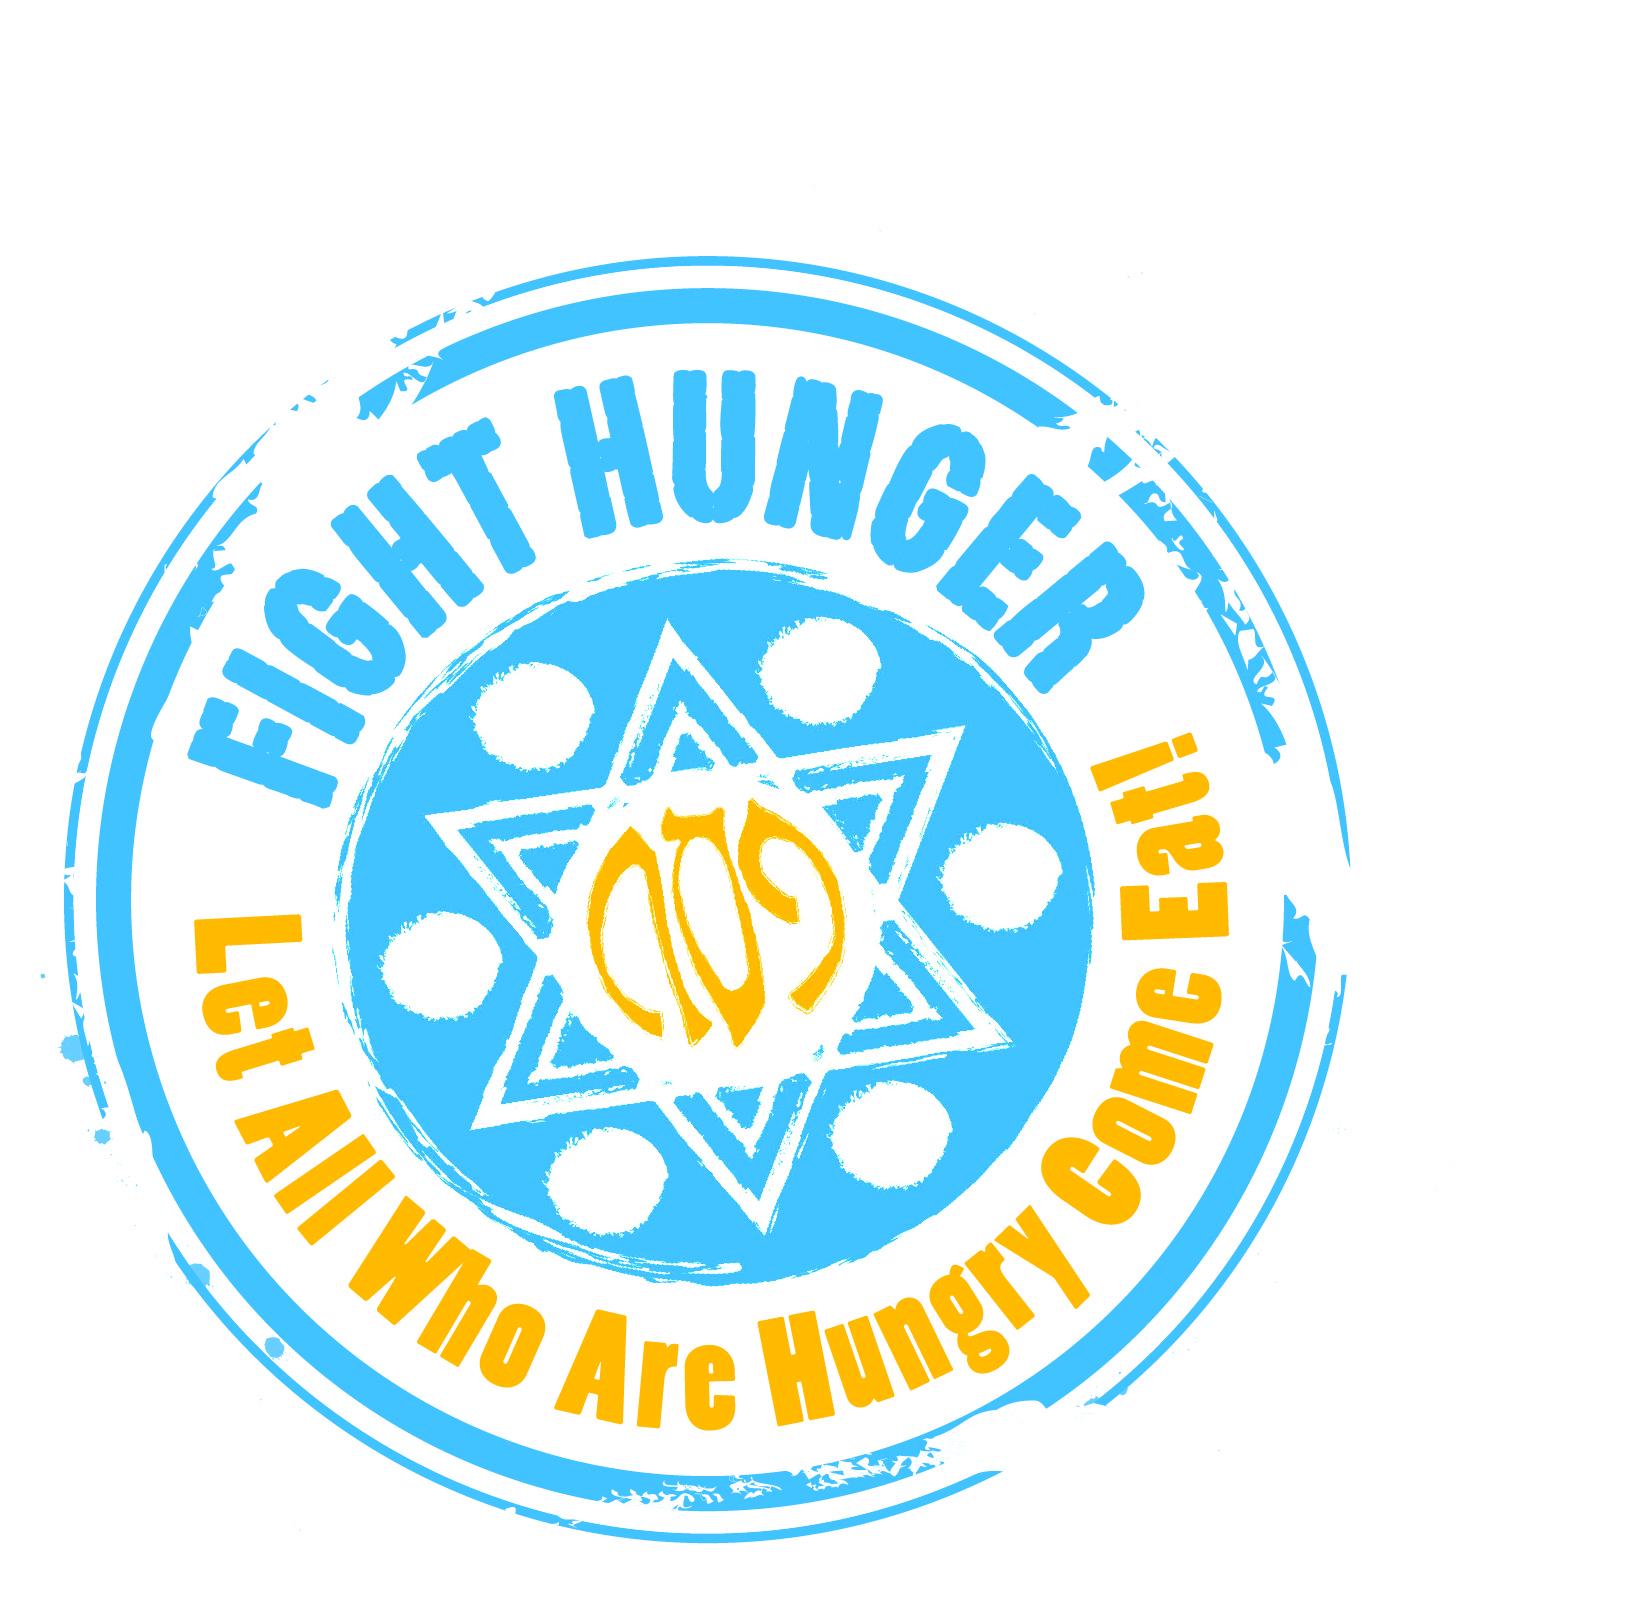 64ad773c15a52a6a2e8c_hunger_logo.jpg